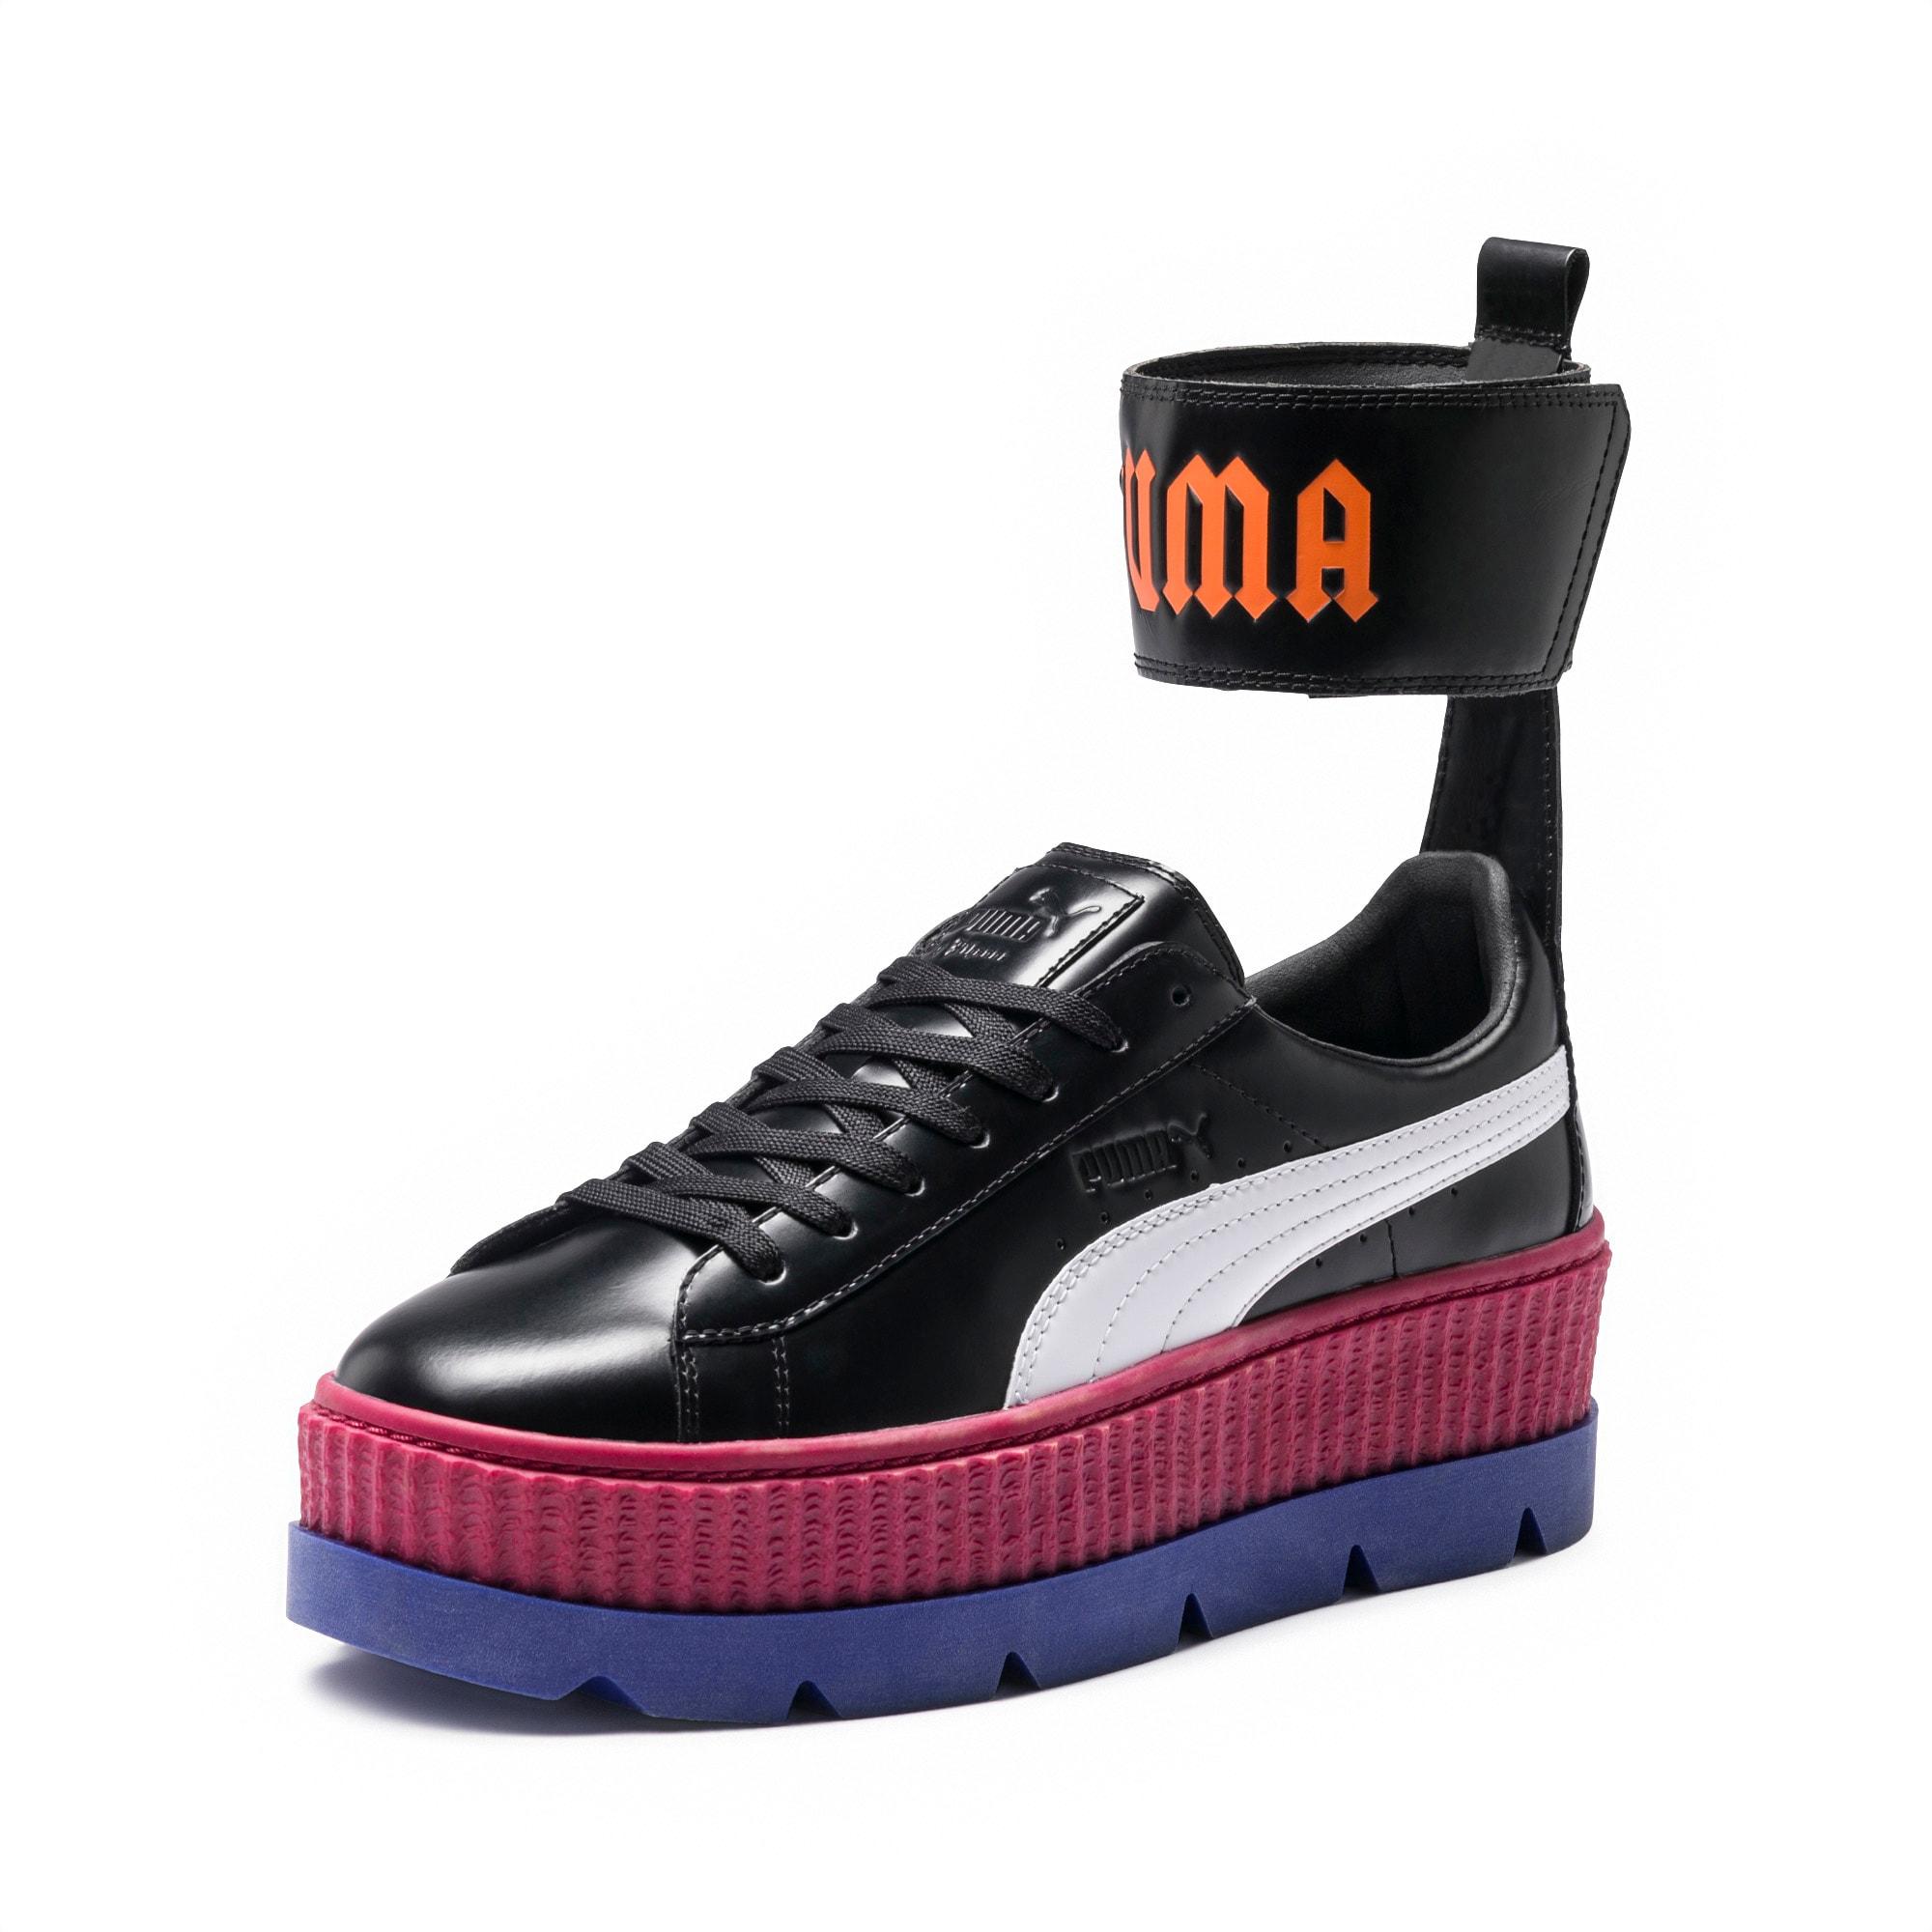 Shop Puma Women's Fenty x Rihanna Ankle Strap Creeper